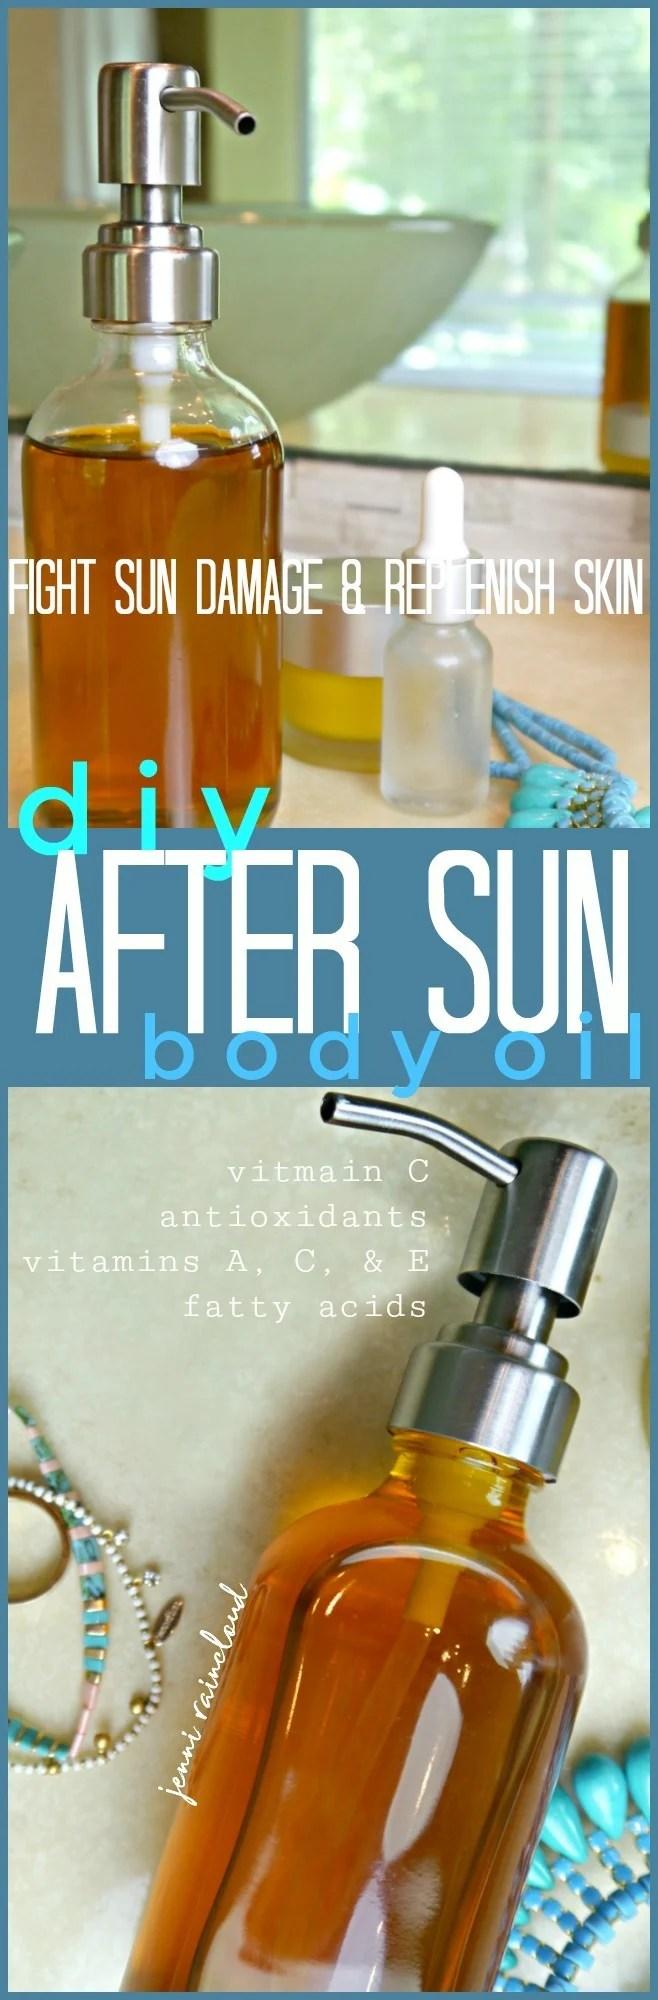 DIY After Sun Body Oil